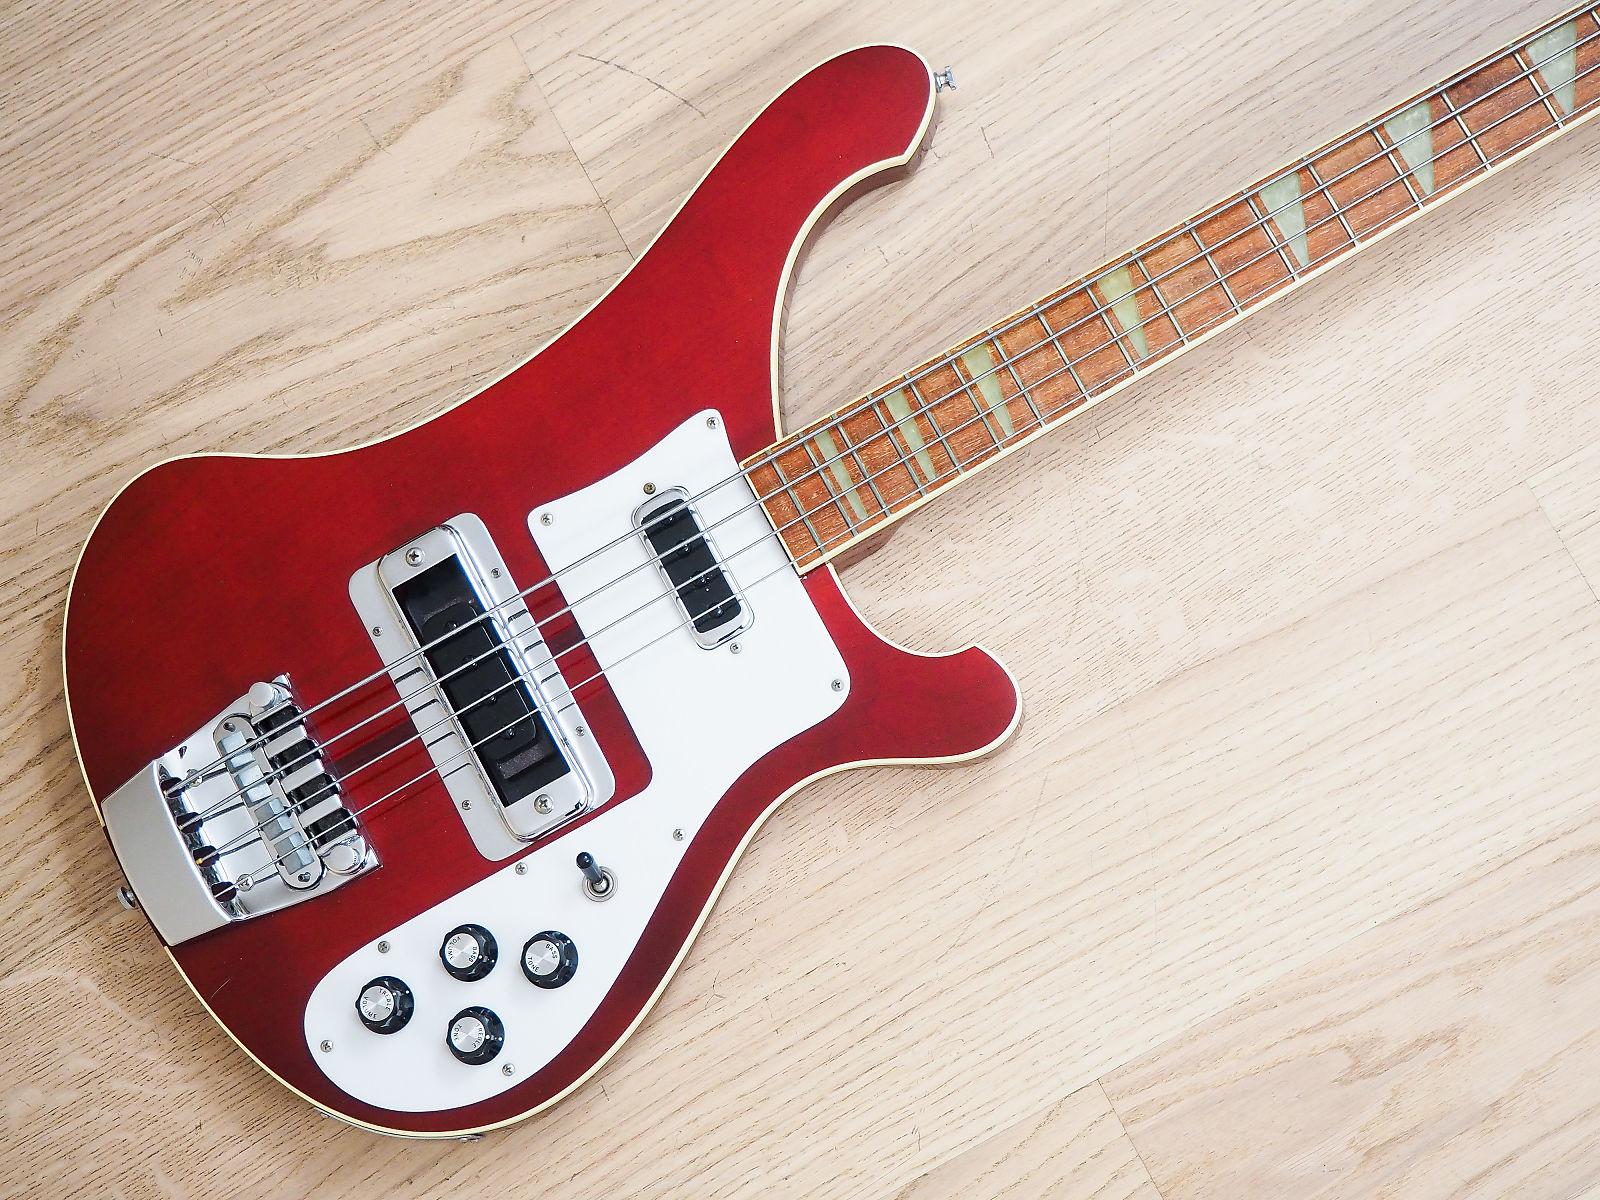 1982 rickenbacker 4001 vintage bass guitar burgundyglo 100 original w hc 4003. Black Bedroom Furniture Sets. Home Design Ideas